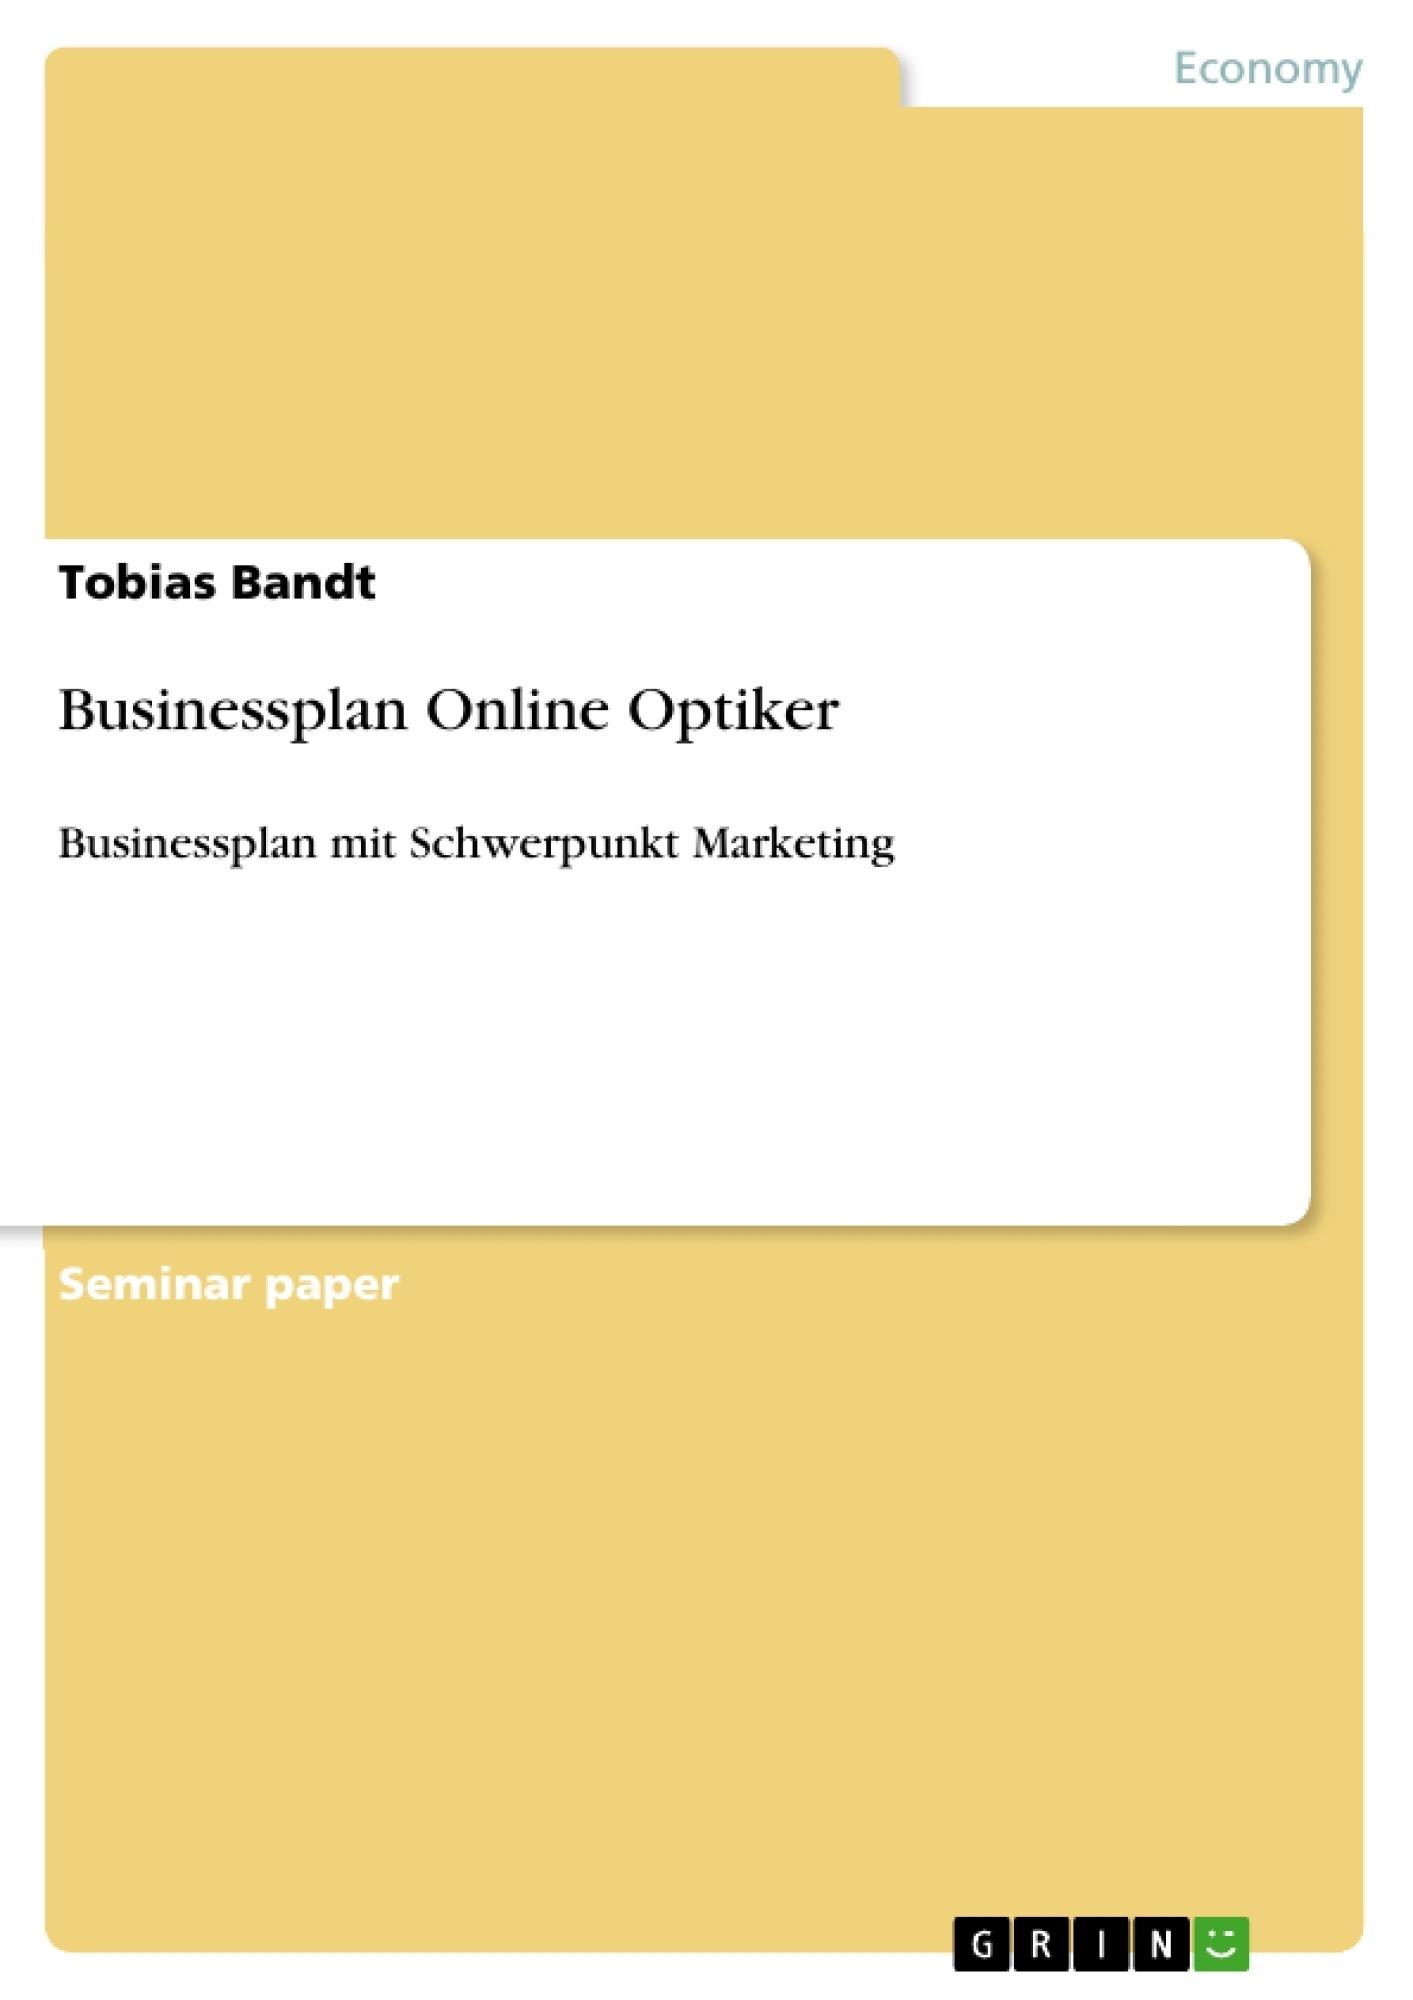 Title: Businessplan Online Optiker